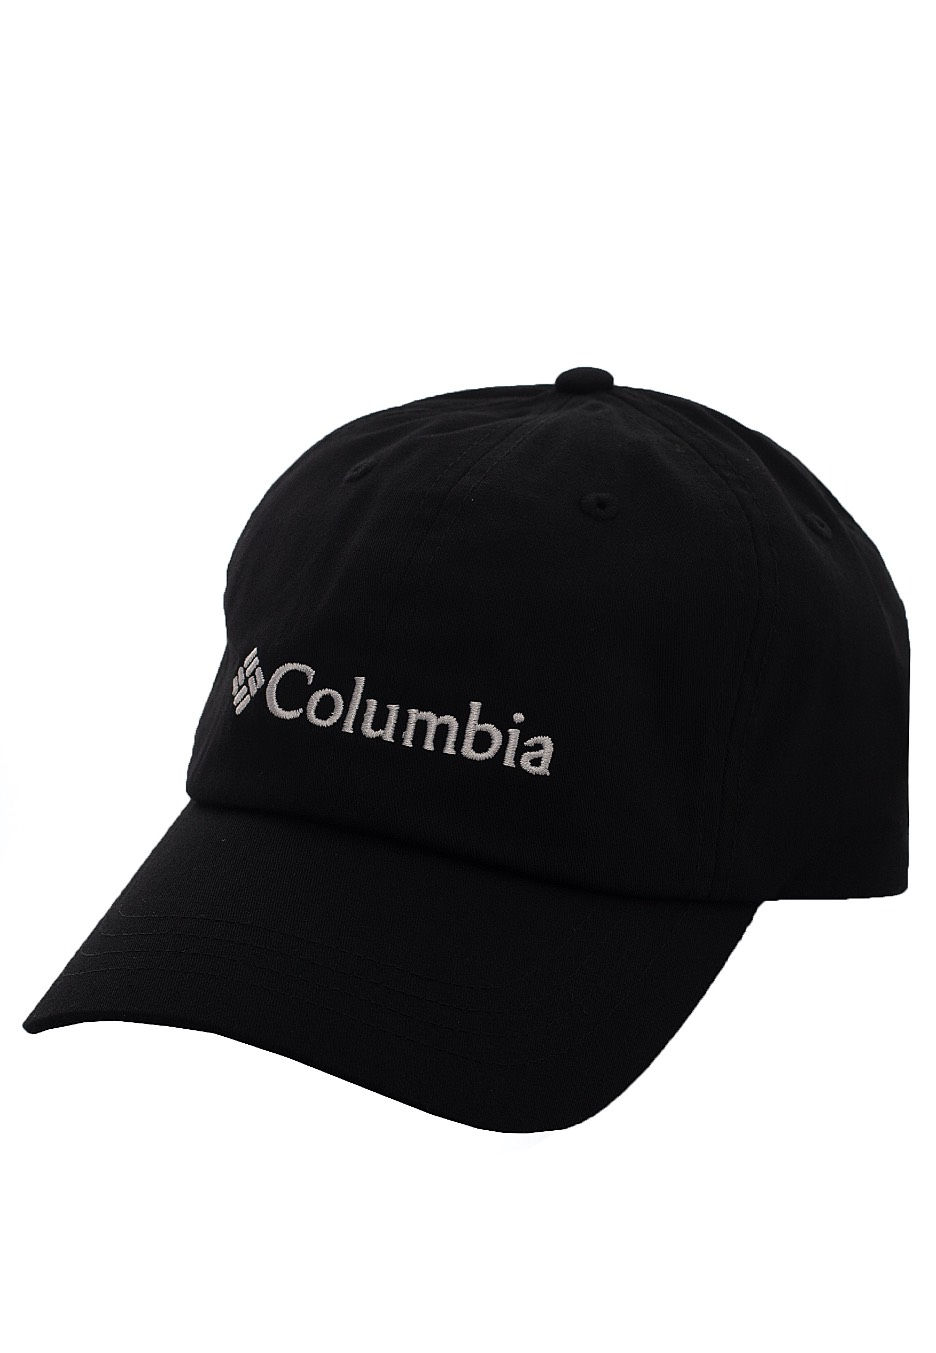 Columbia Boutique streetwear FR